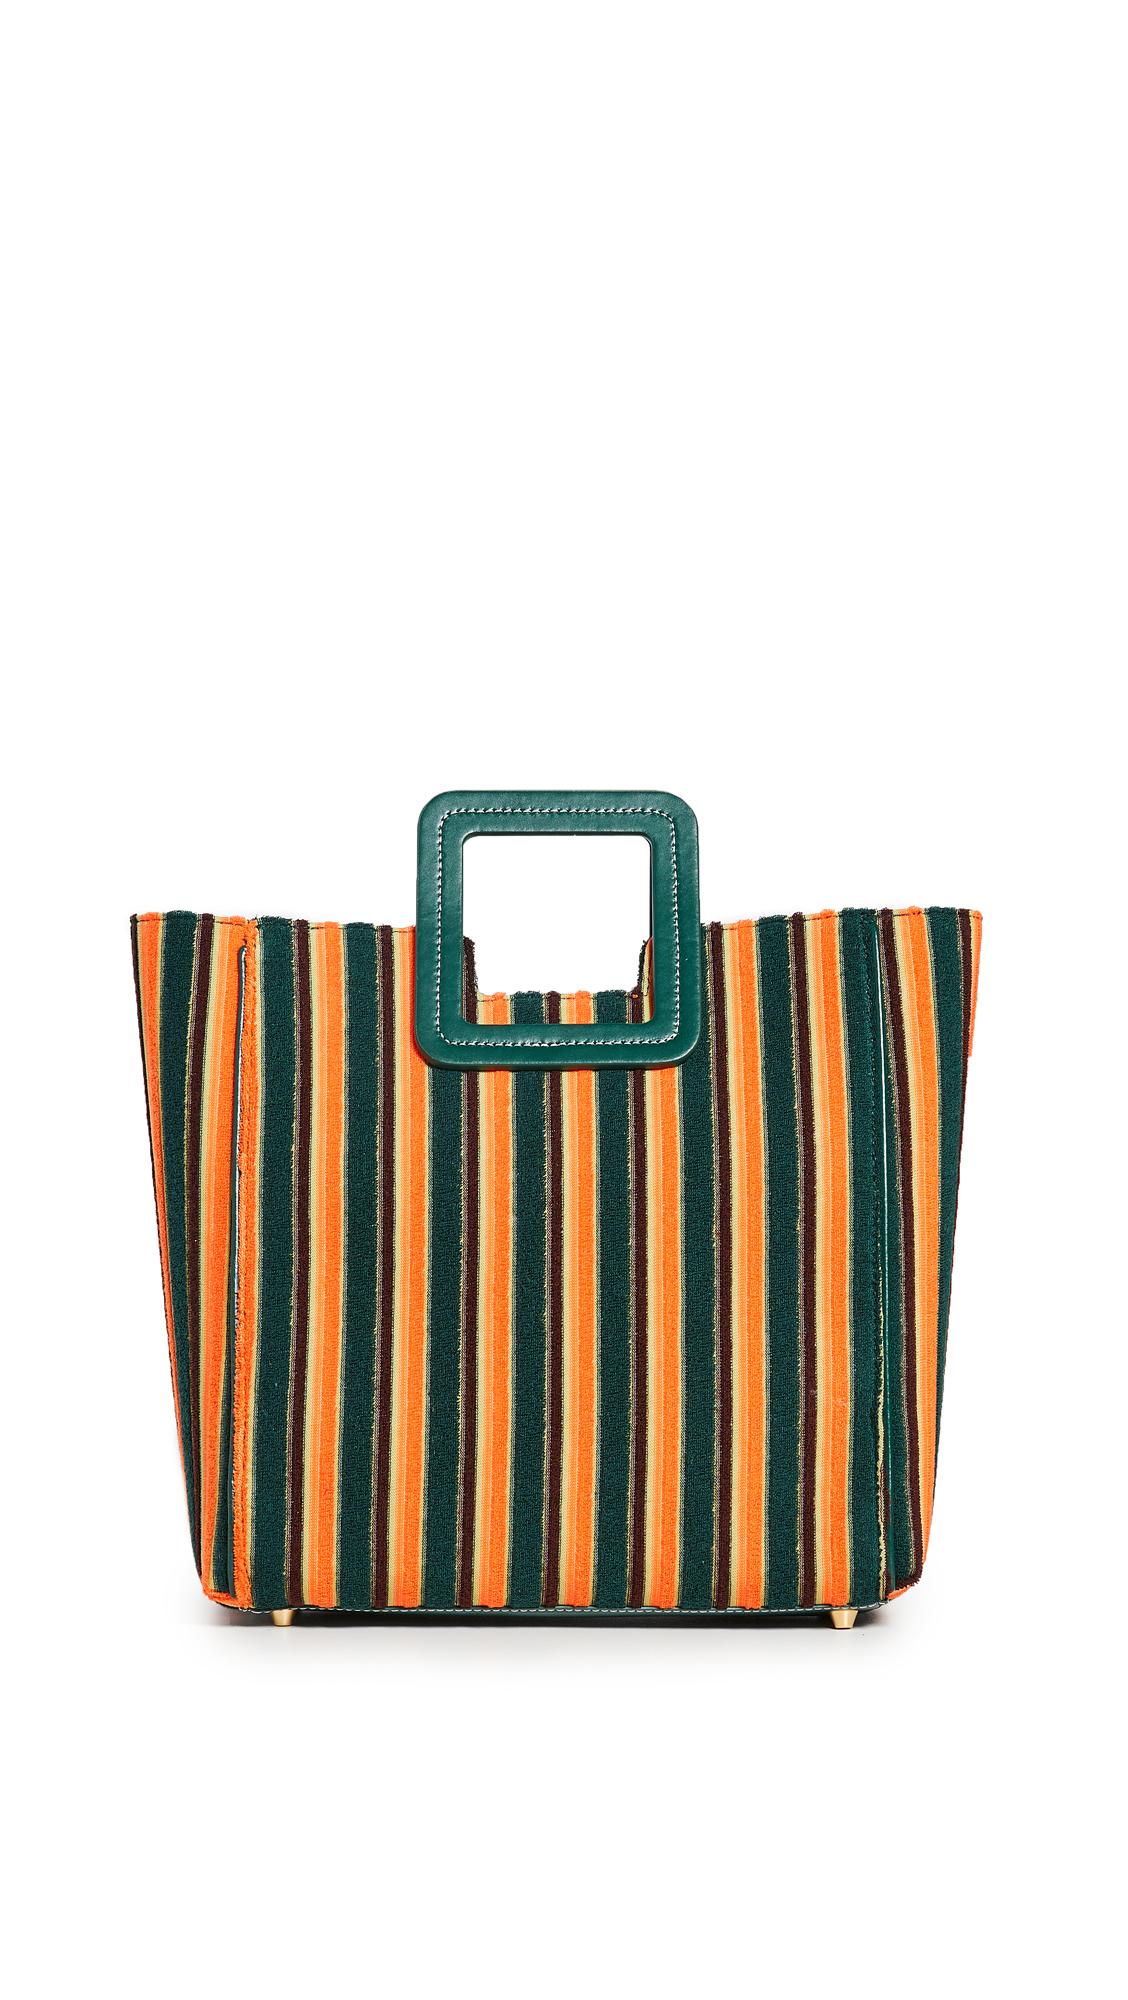 STAUD Shirley Bag - Pistachio Cantaloupe Stripe